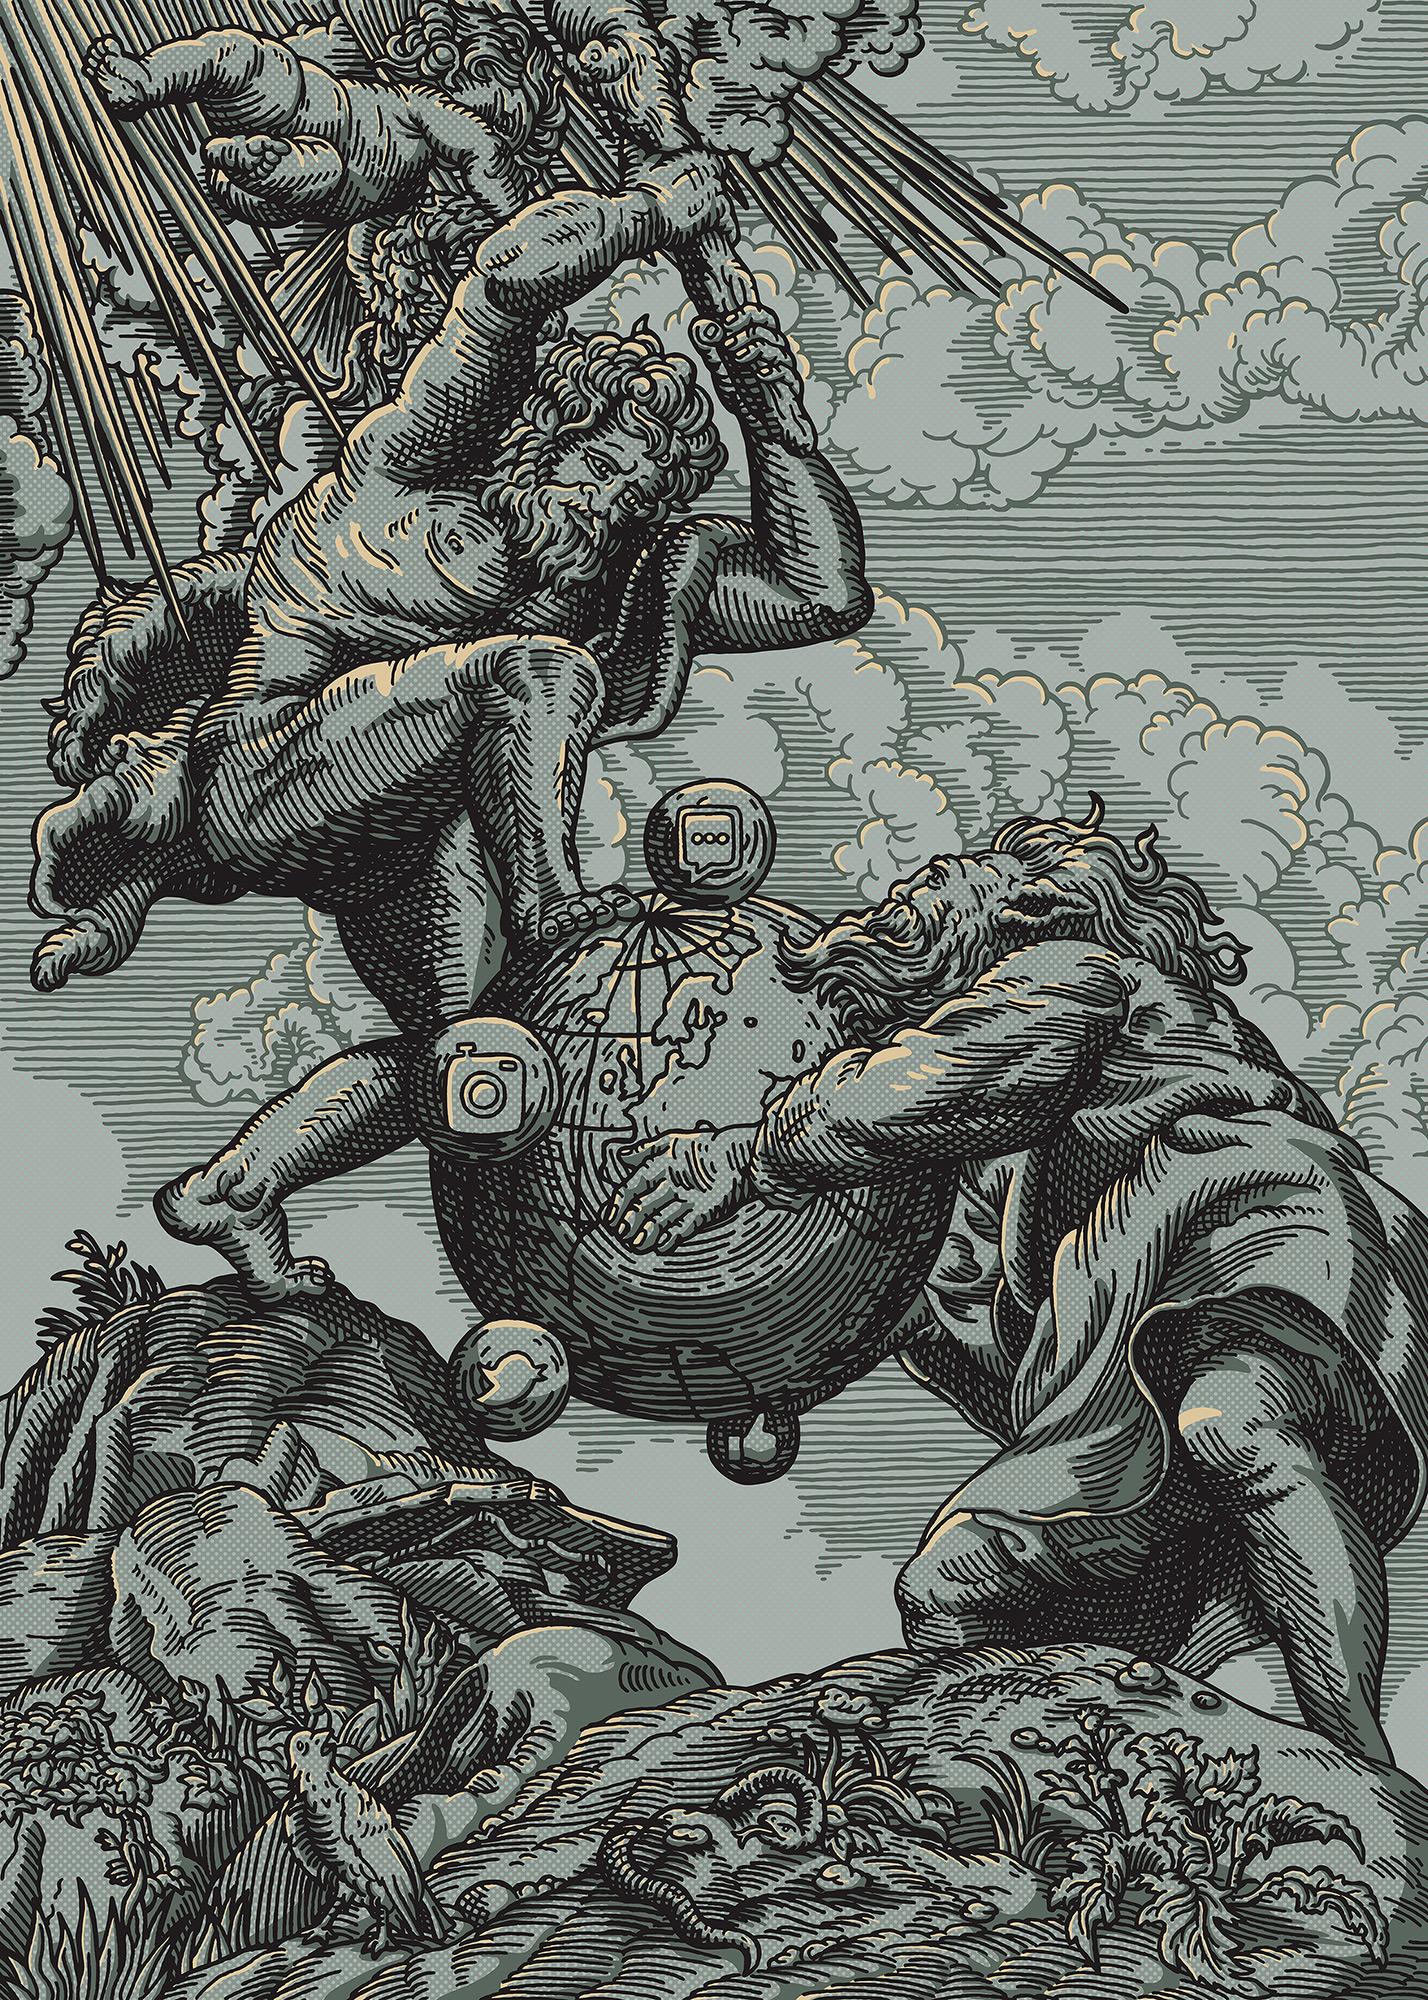 The 13th Labour in Silver